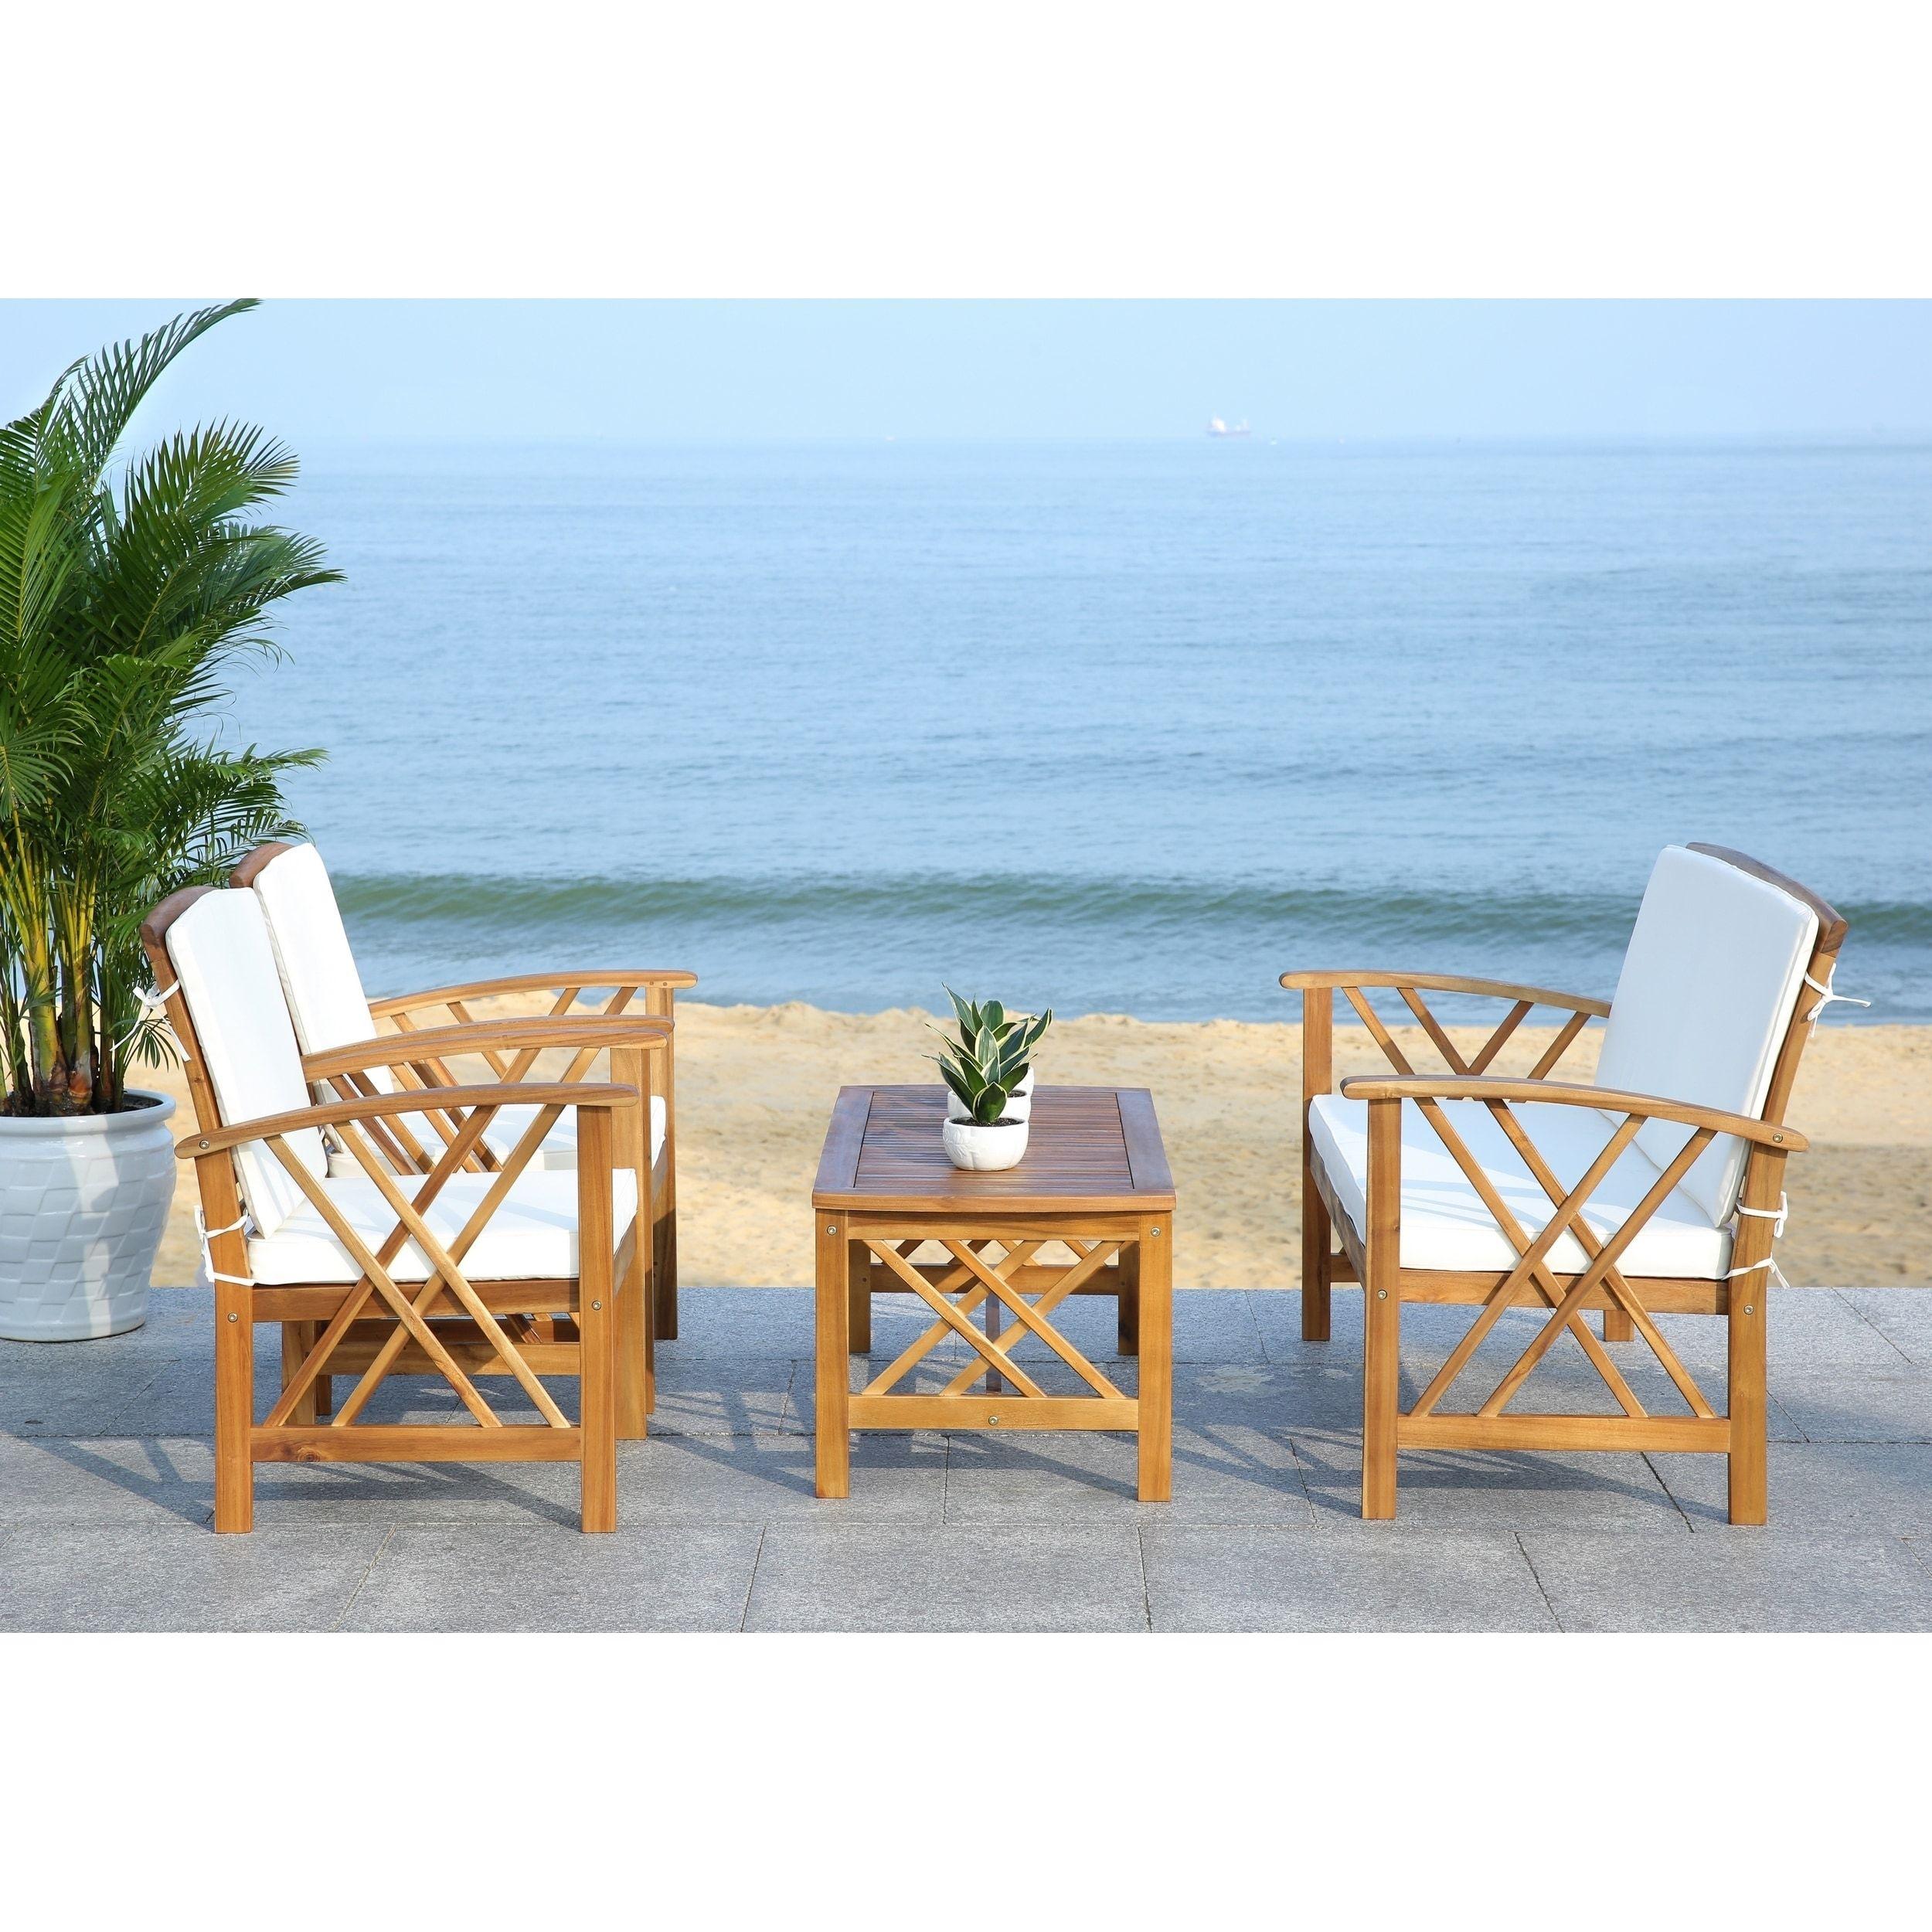 Safavieh Outdoor Living Fontana 4 Pc Outdoor Set | Outdoor ... on Safavieh Fontana 4 Pc Outdoor Set id=16686